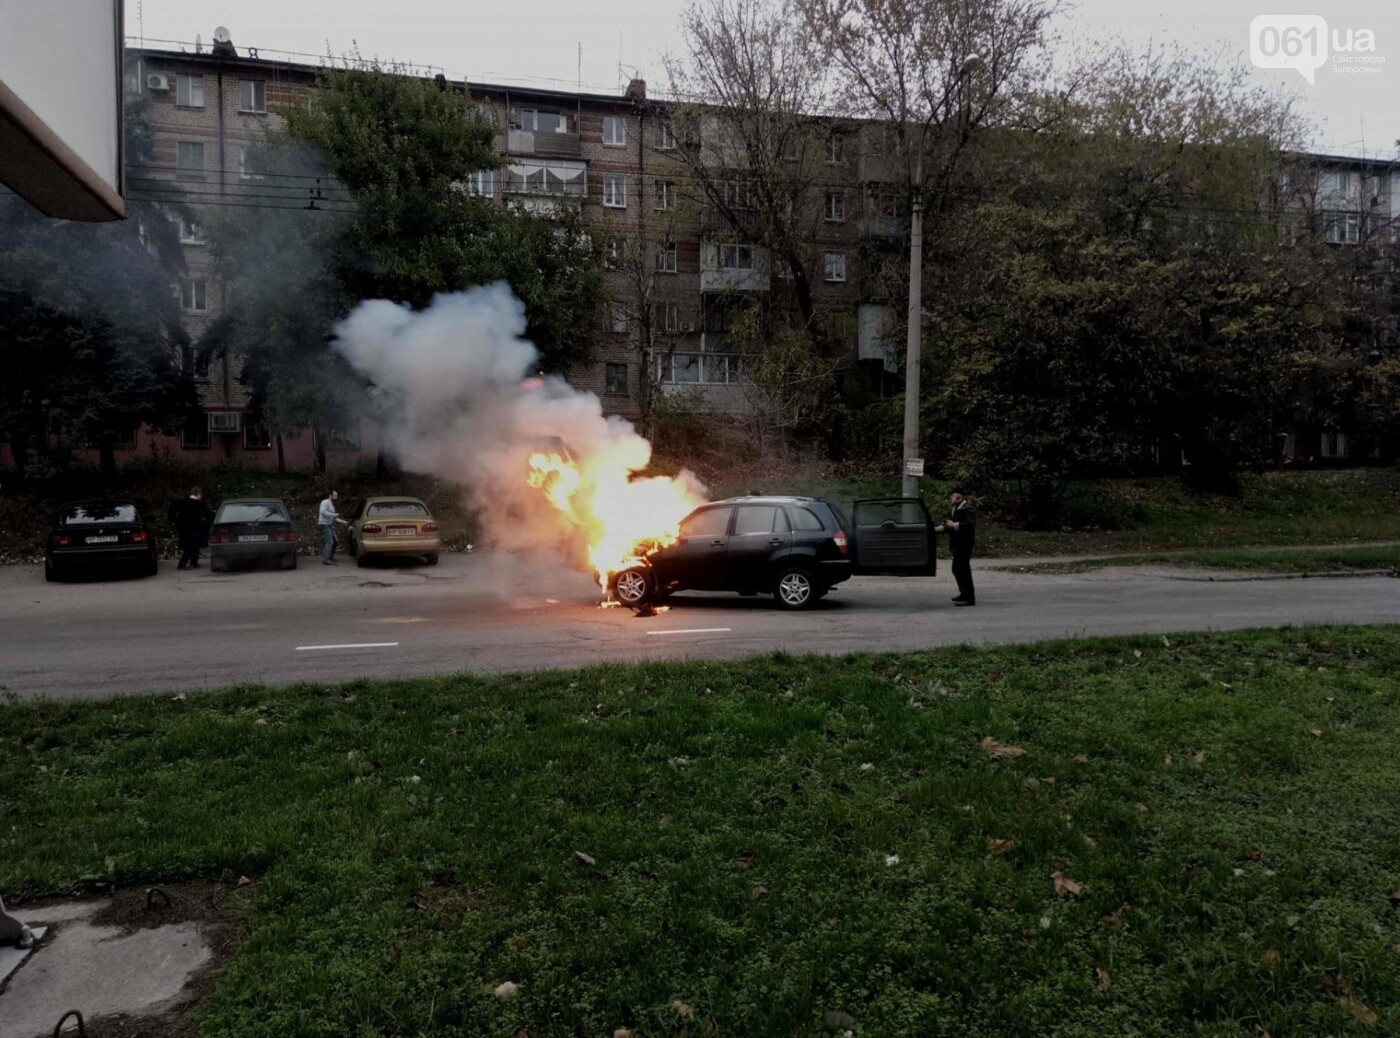 В Запорожье посреди дороги загорелся автомобиль, - ФОТО , фото-3